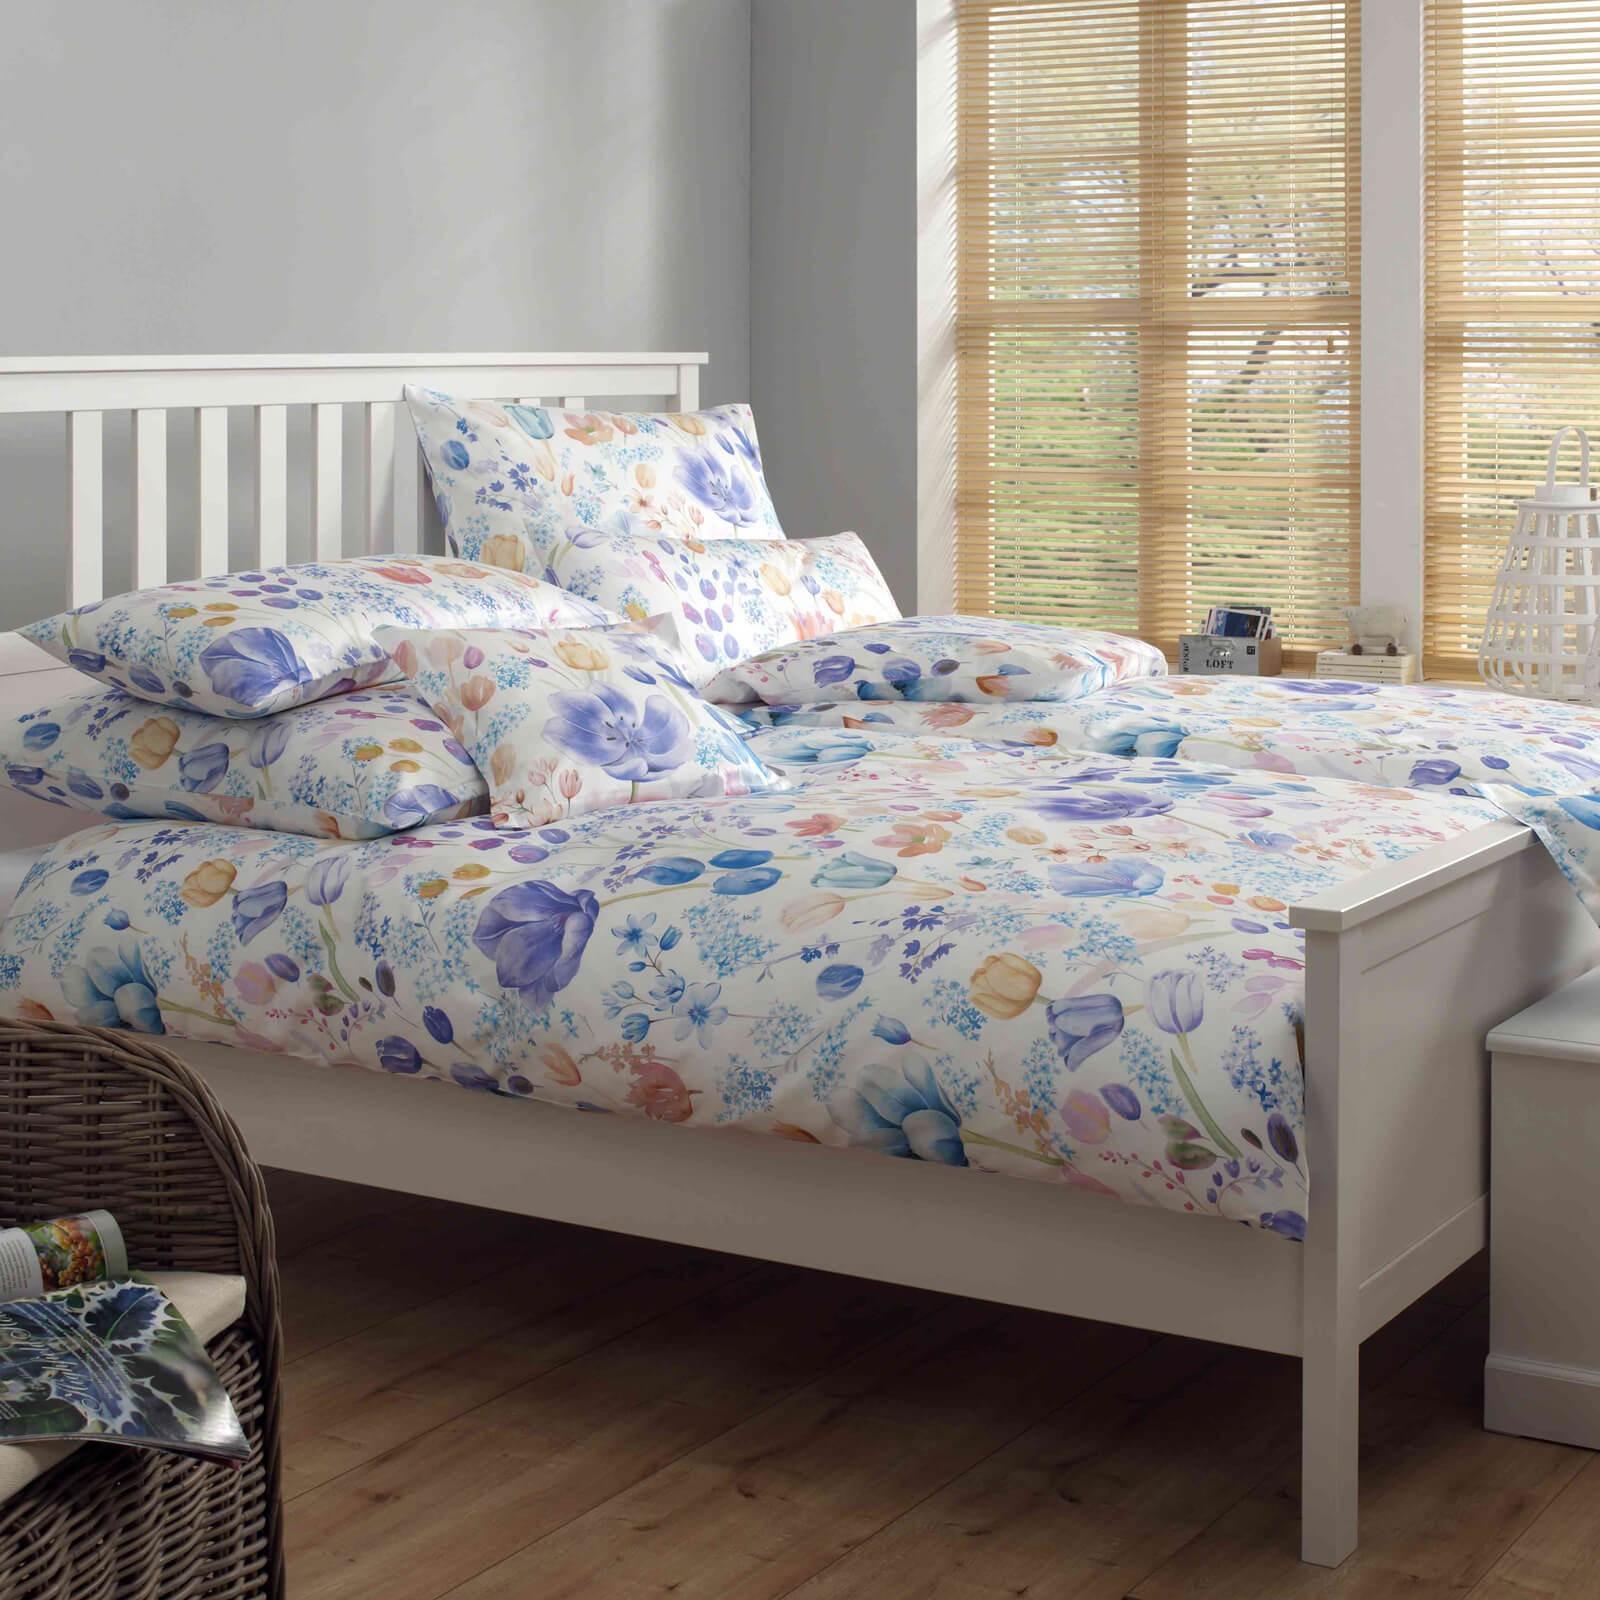 bettw sche elegante fleuri 2120 ciel. Black Bedroom Furniture Sets. Home Design Ideas